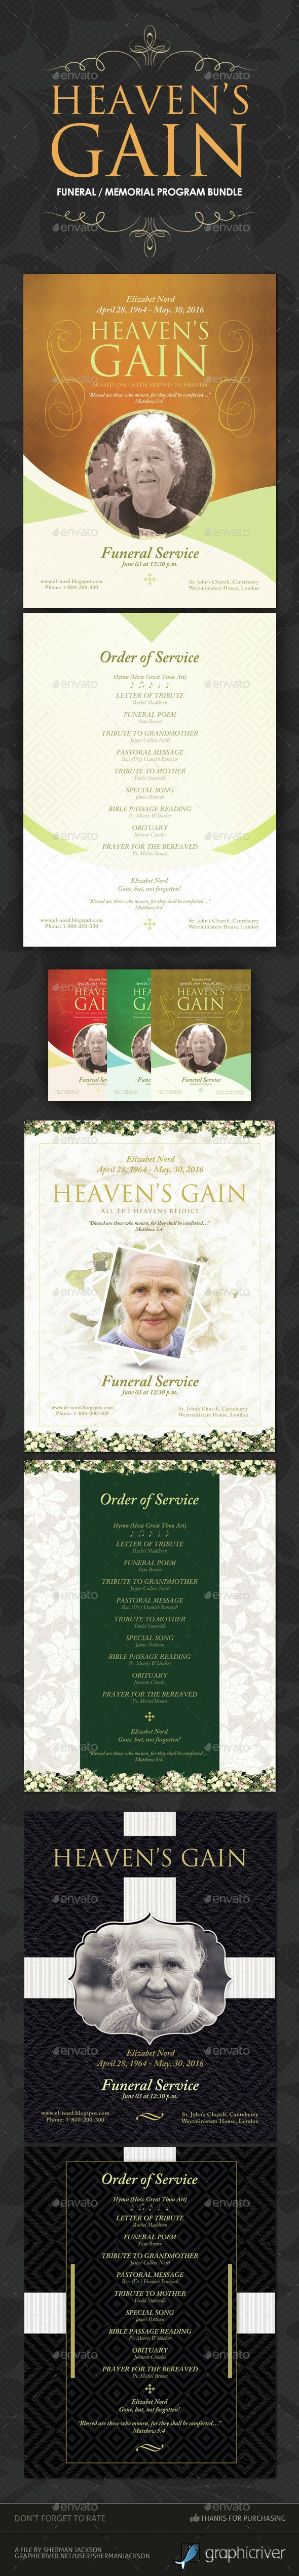 Funeral / Memorial Program Templates - BUNDLE | Funeral y Photoshop